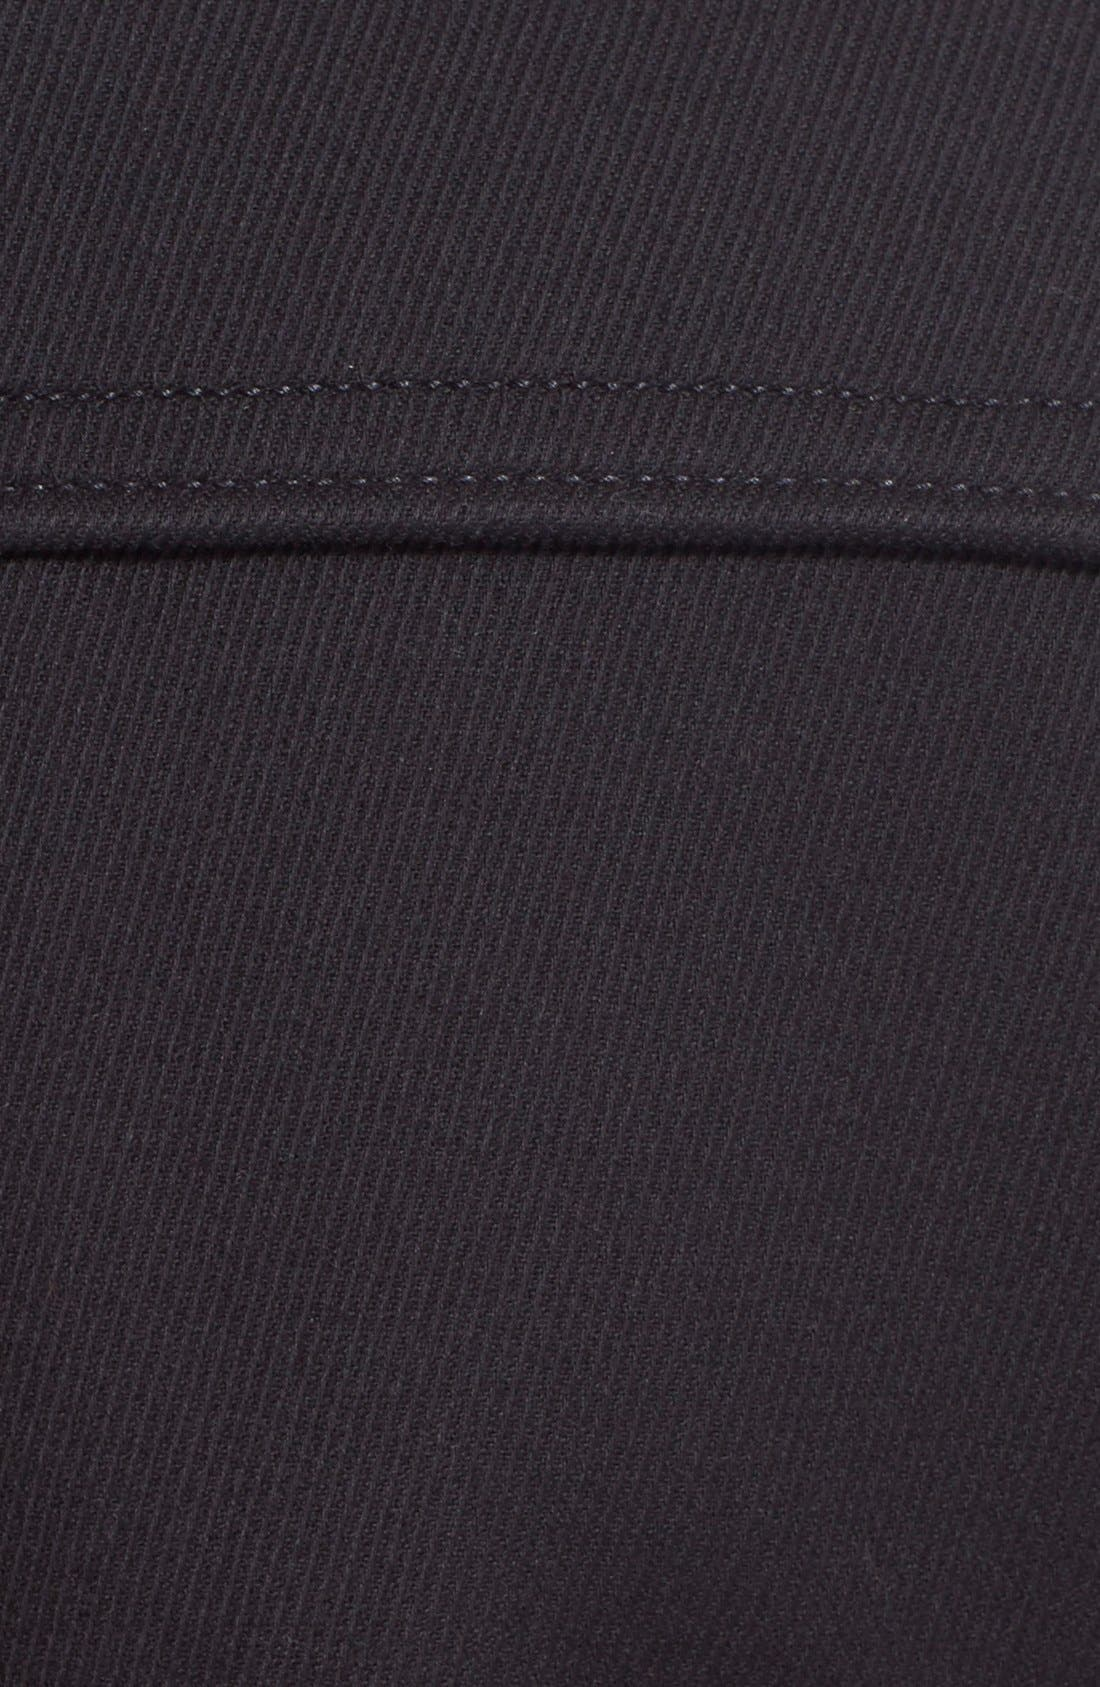 Alternate Image 3  - BurberryLondon 'Whittingstall' Wool Military Coat